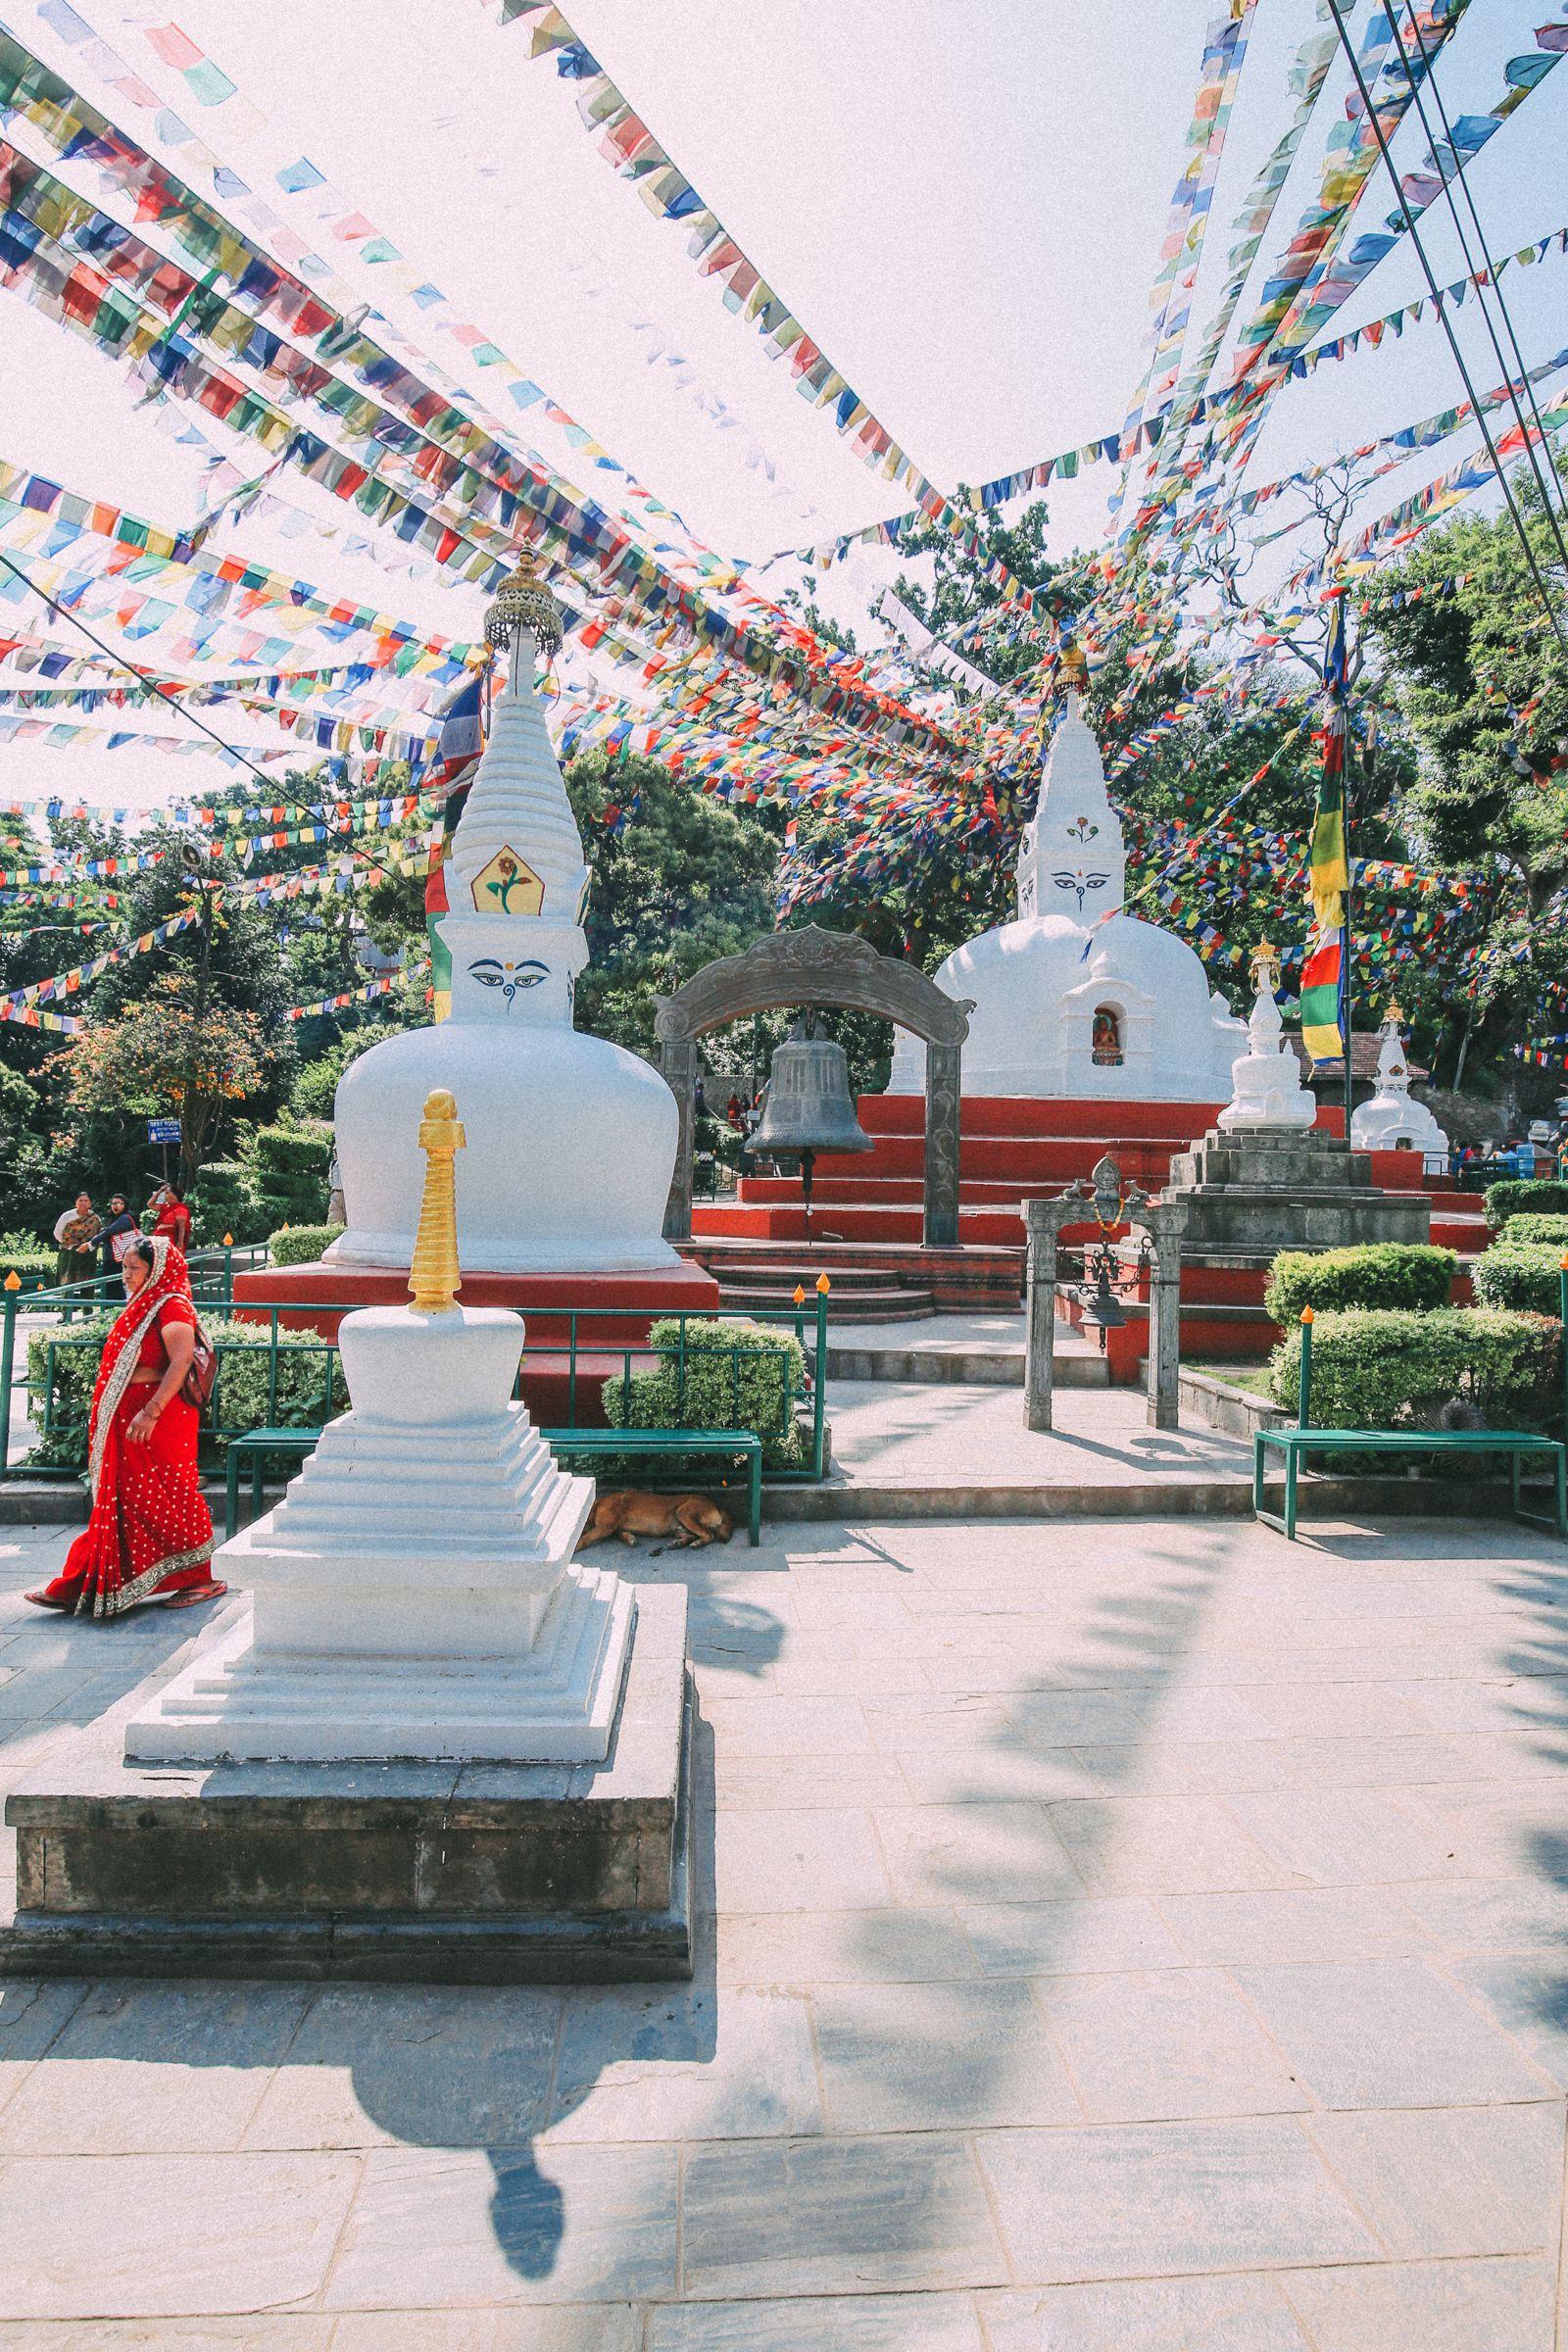 Exploring Swayambhunath Stupa - The Monkey Temple In Kathmandu, Nepal (1)